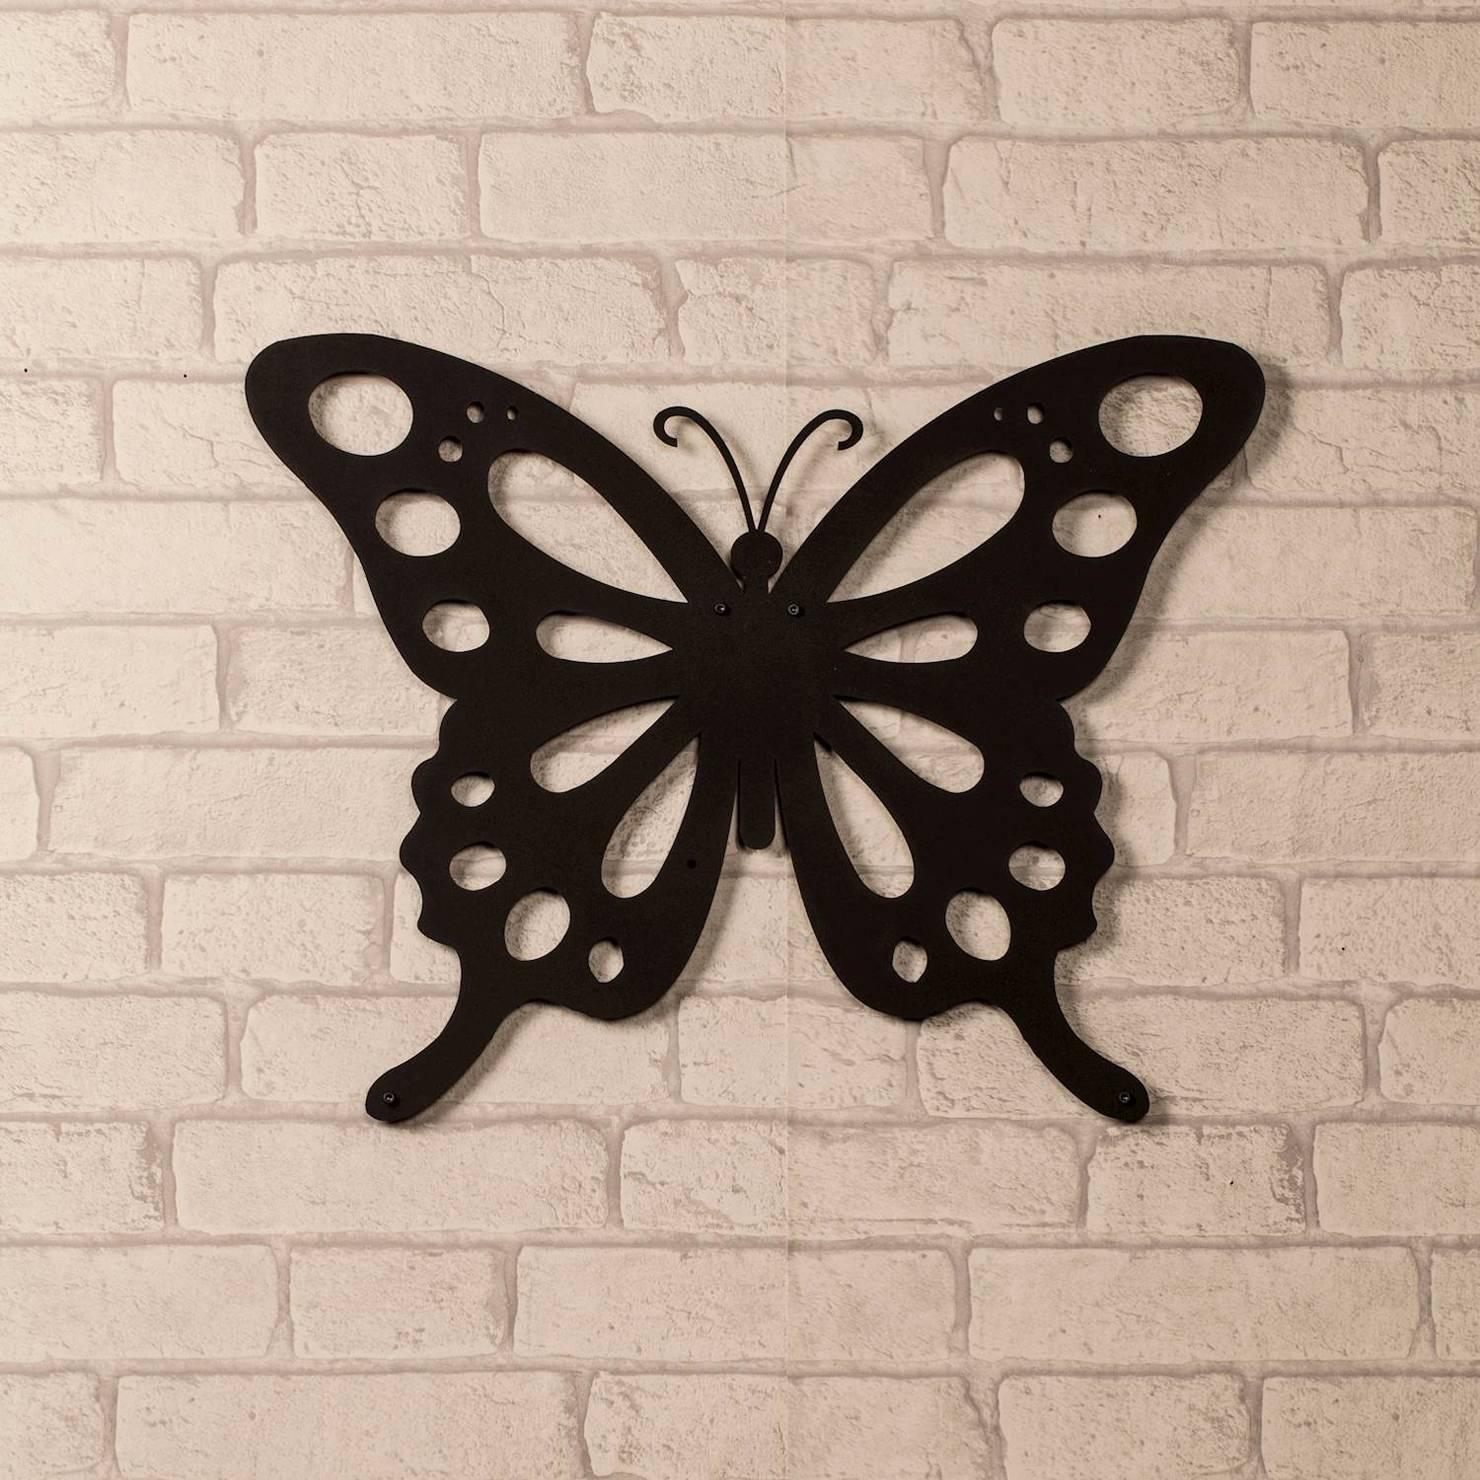 Butterfly Metal Wall Art, Black | Achica Intended For 2018 Butterfly Metal Wall Art (View 6 of 20)